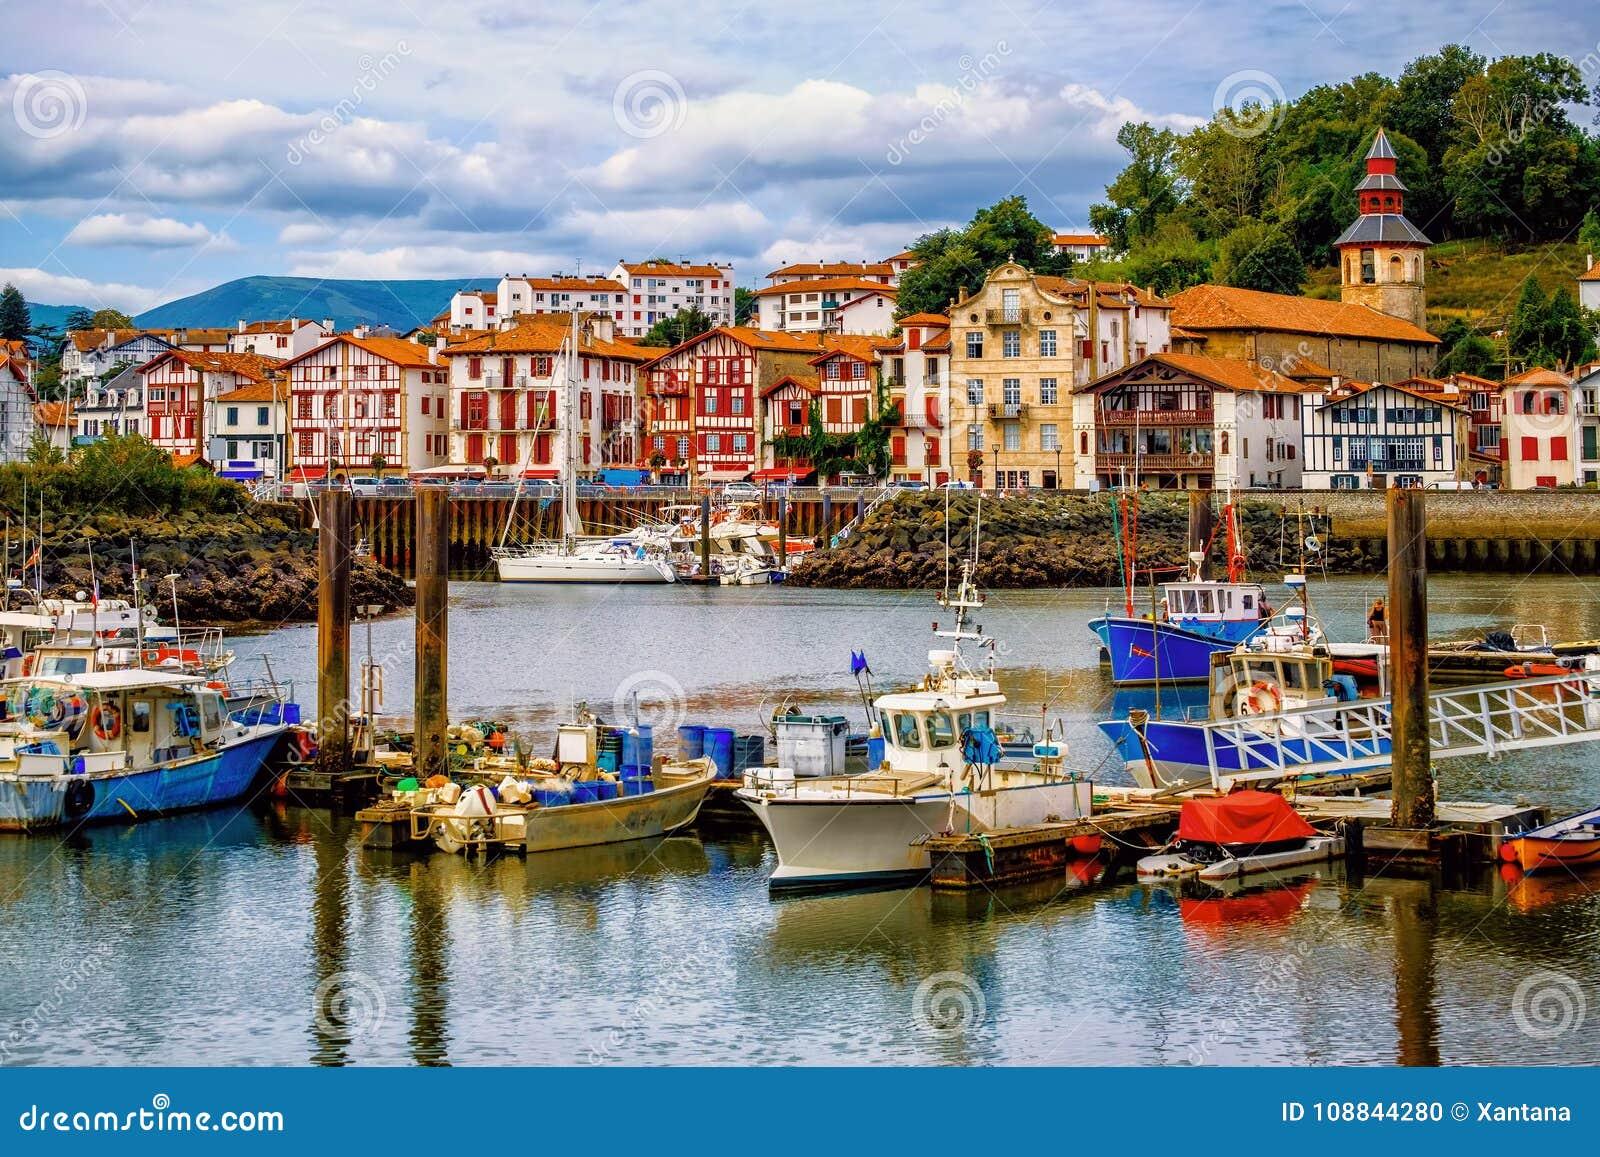 colorful basque houses in port of saint jean de luz france stock photo image of saint. Black Bedroom Furniture Sets. Home Design Ideas